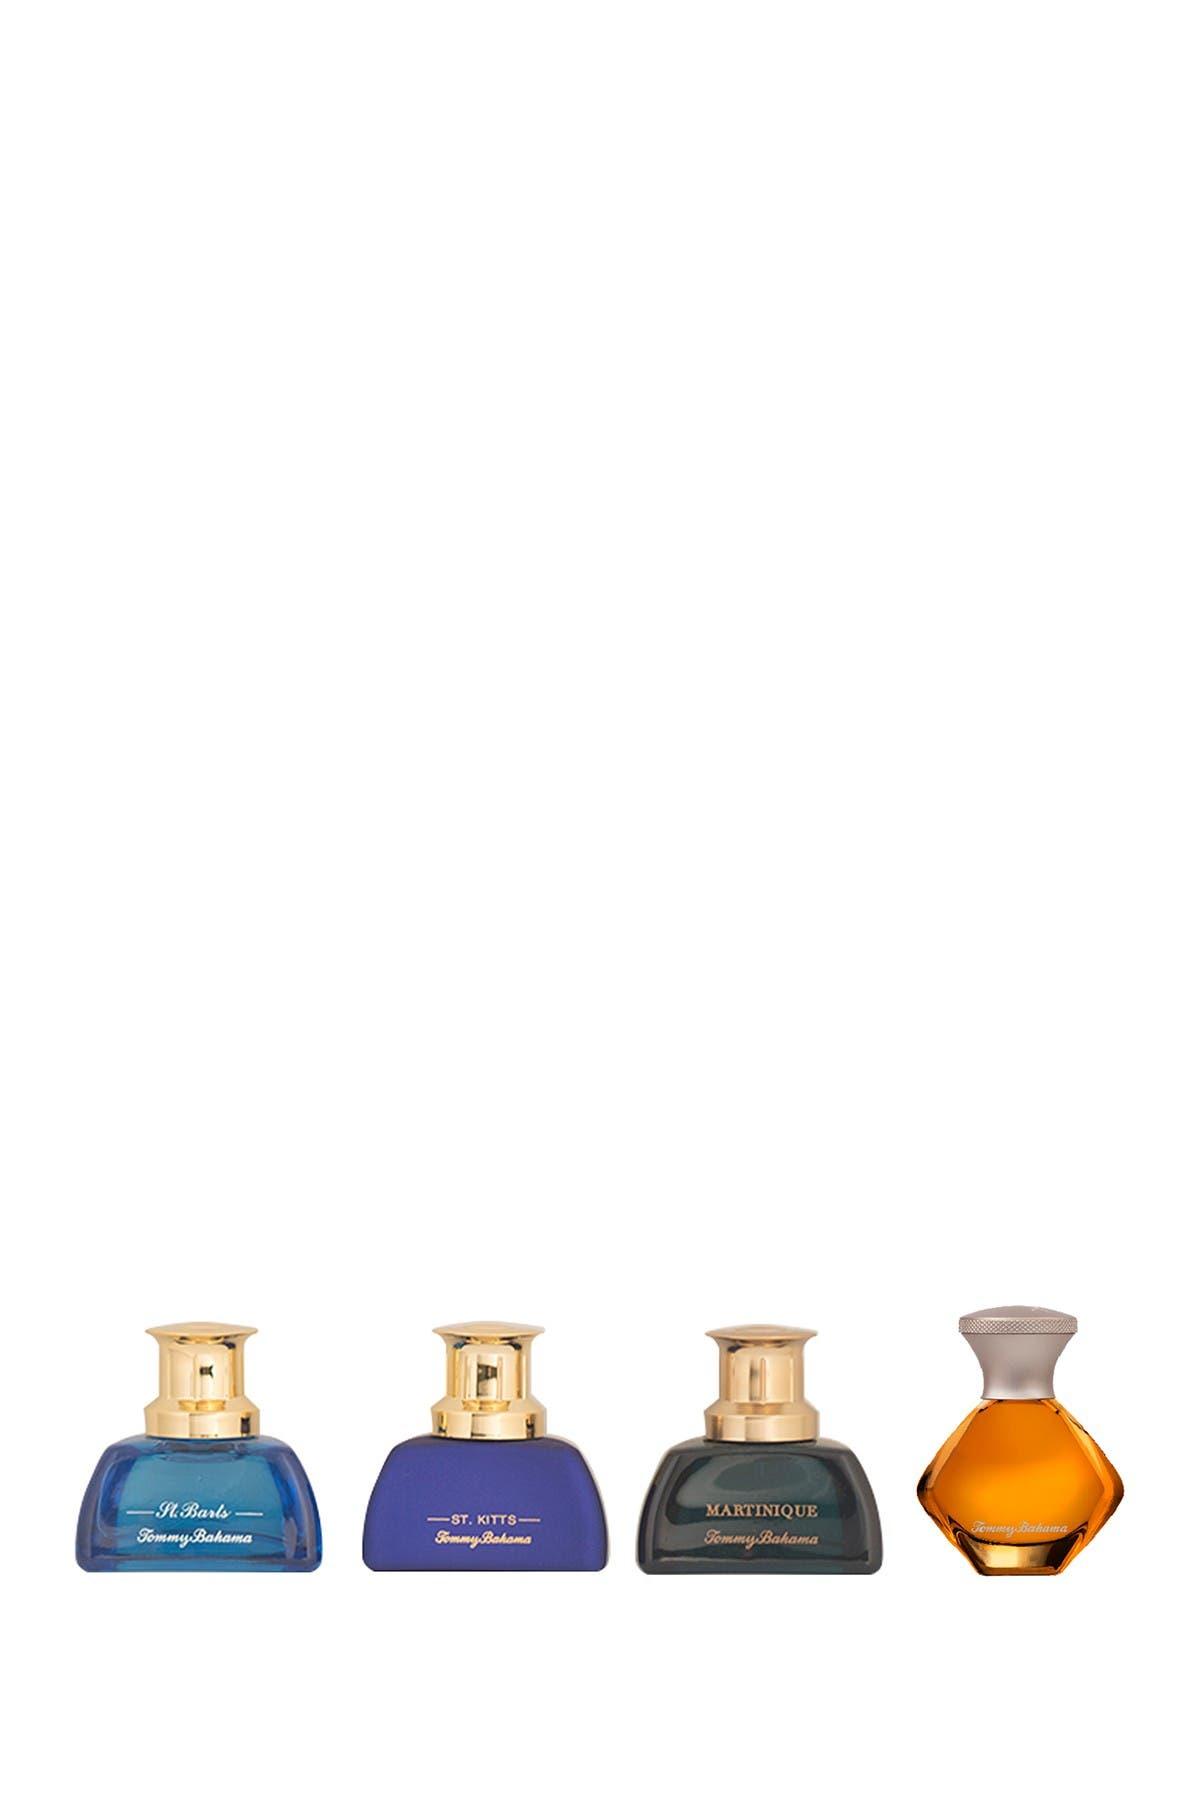 Image of Tommy Bahama Coffret Fragrance - 4-Piece Set